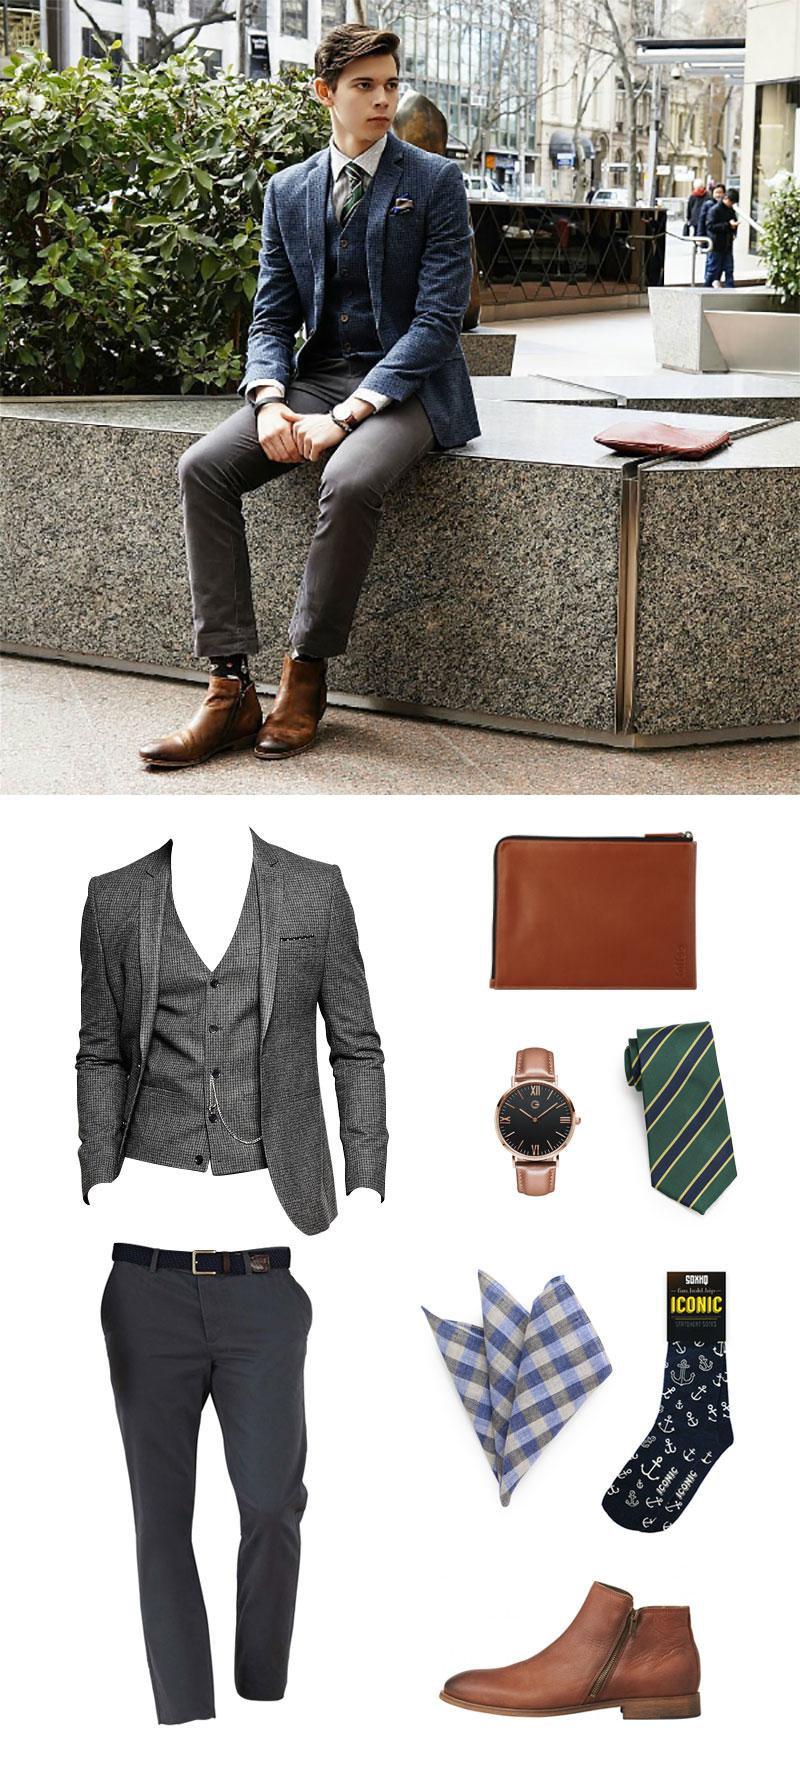 Latest Fashion Trends Part 5